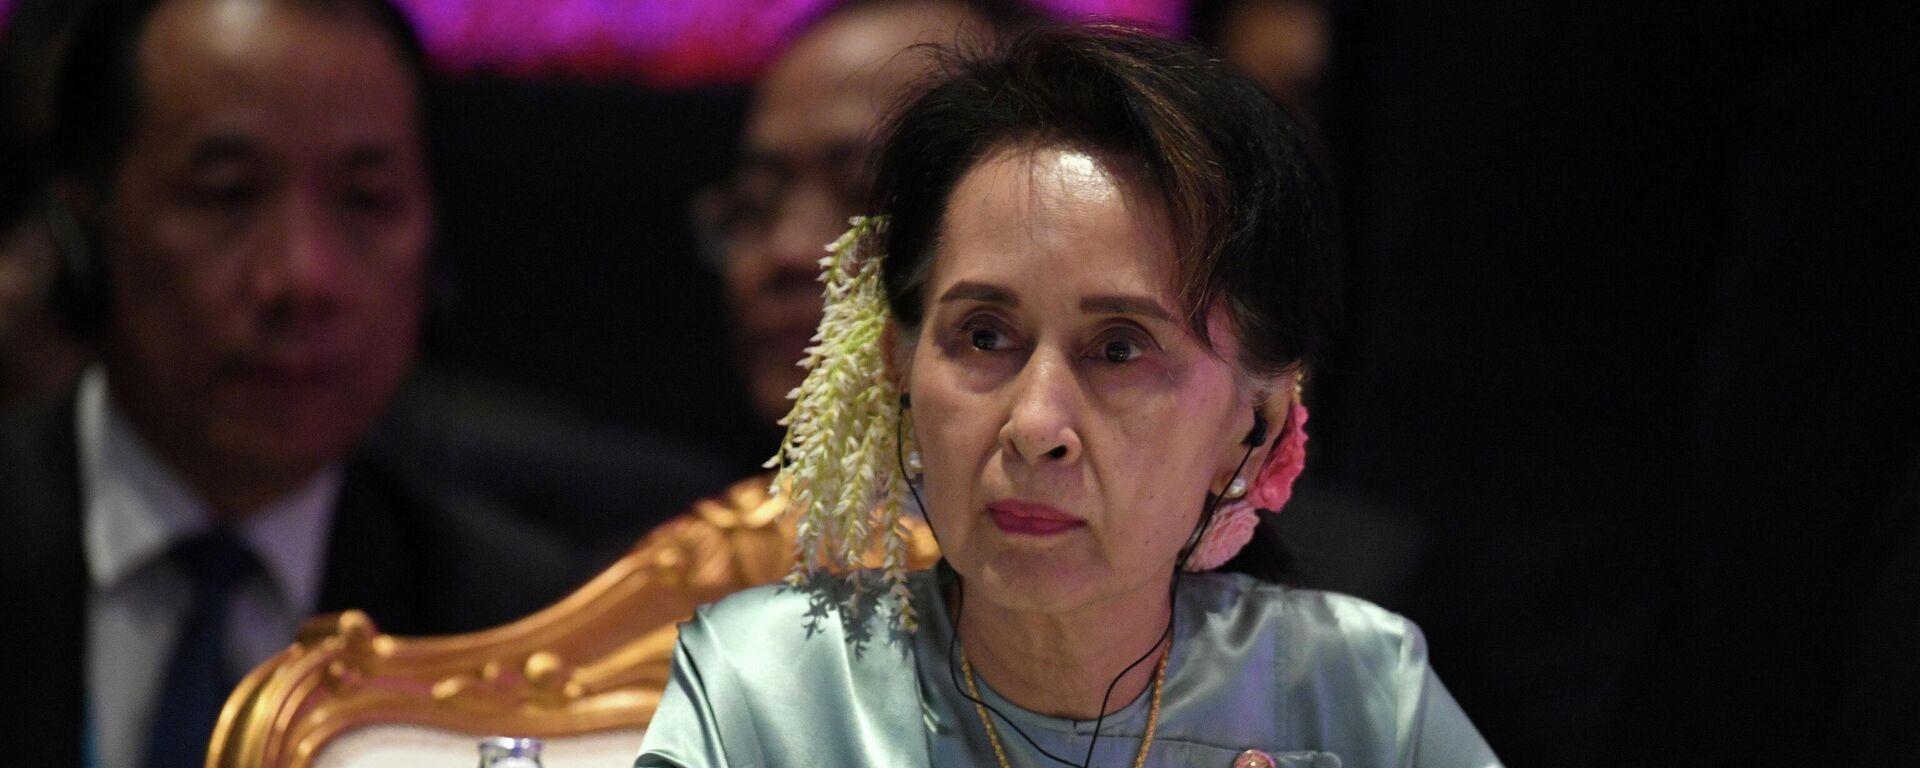 Aung San Suu Kyi (Archivbild) - SNA, 1920, 10.06.2021